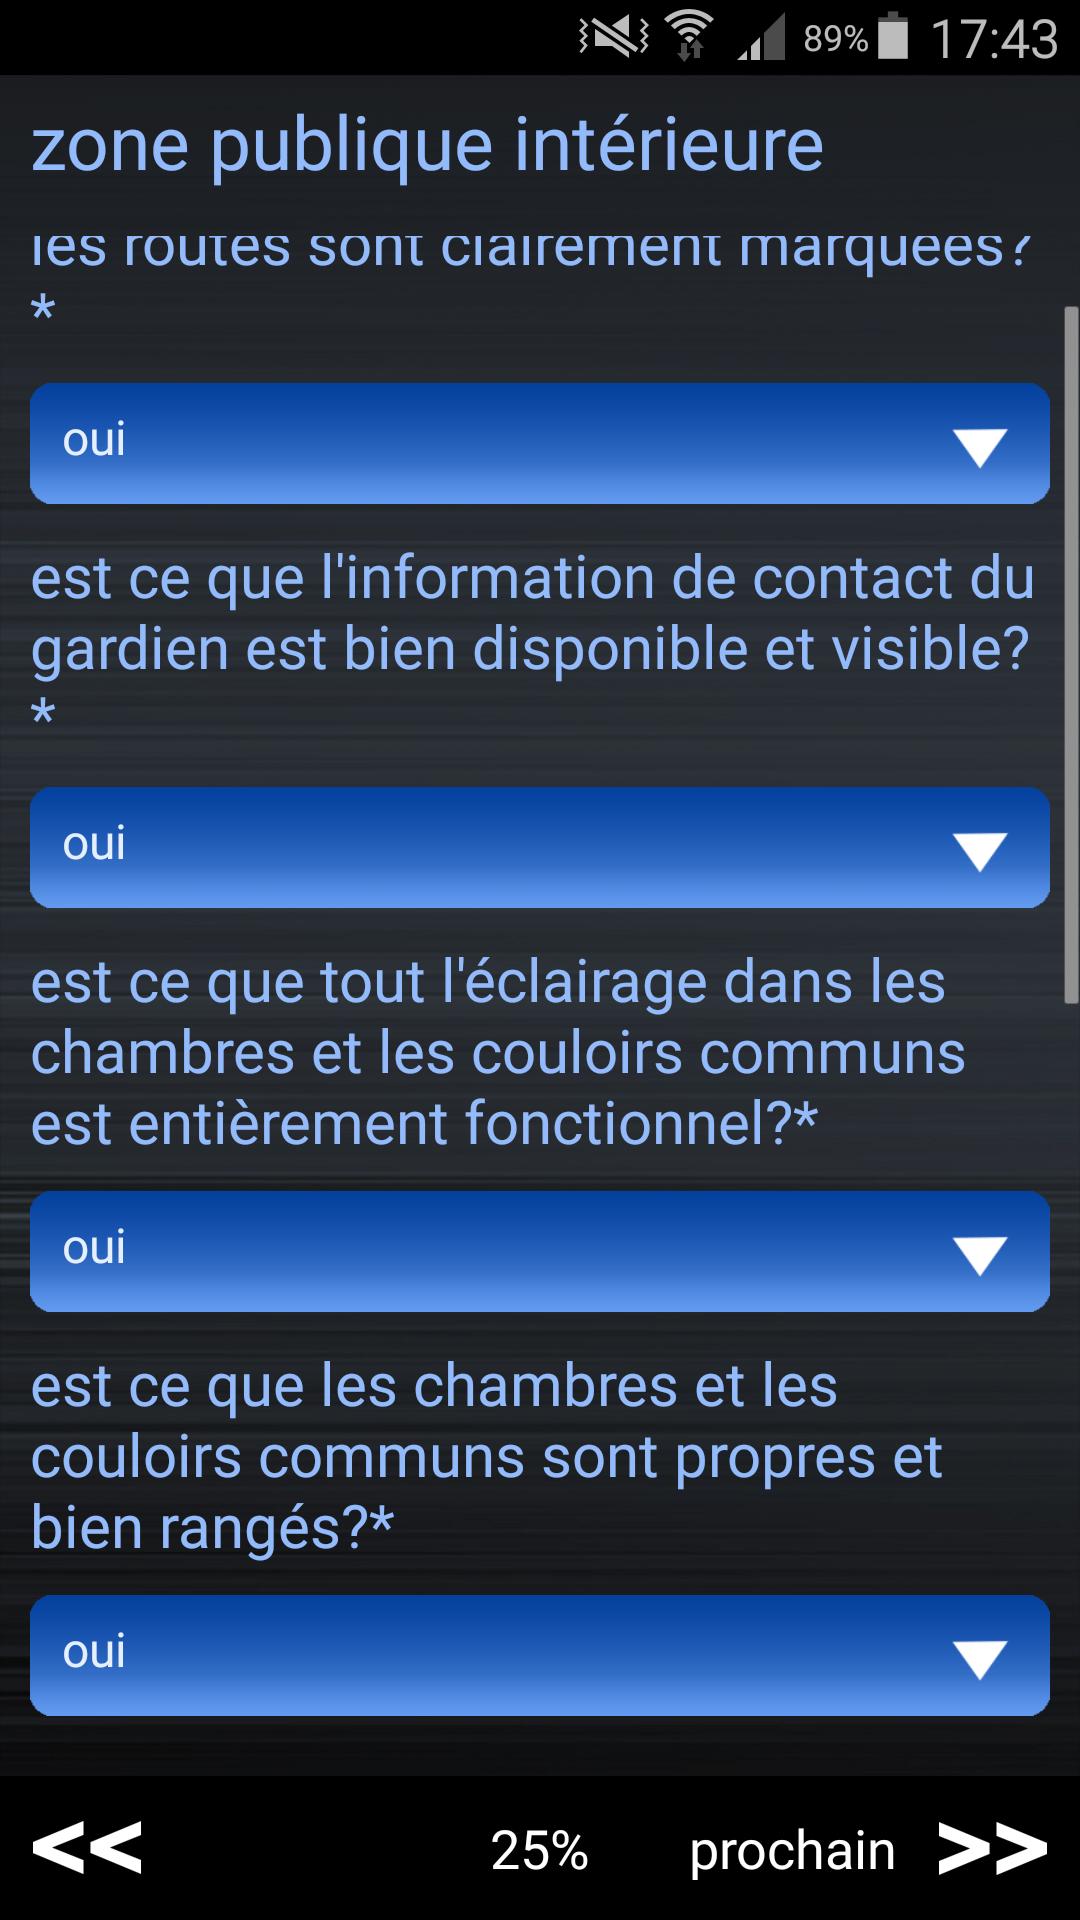 ginstr_app_buildingMaintenanceManagement_FR_5